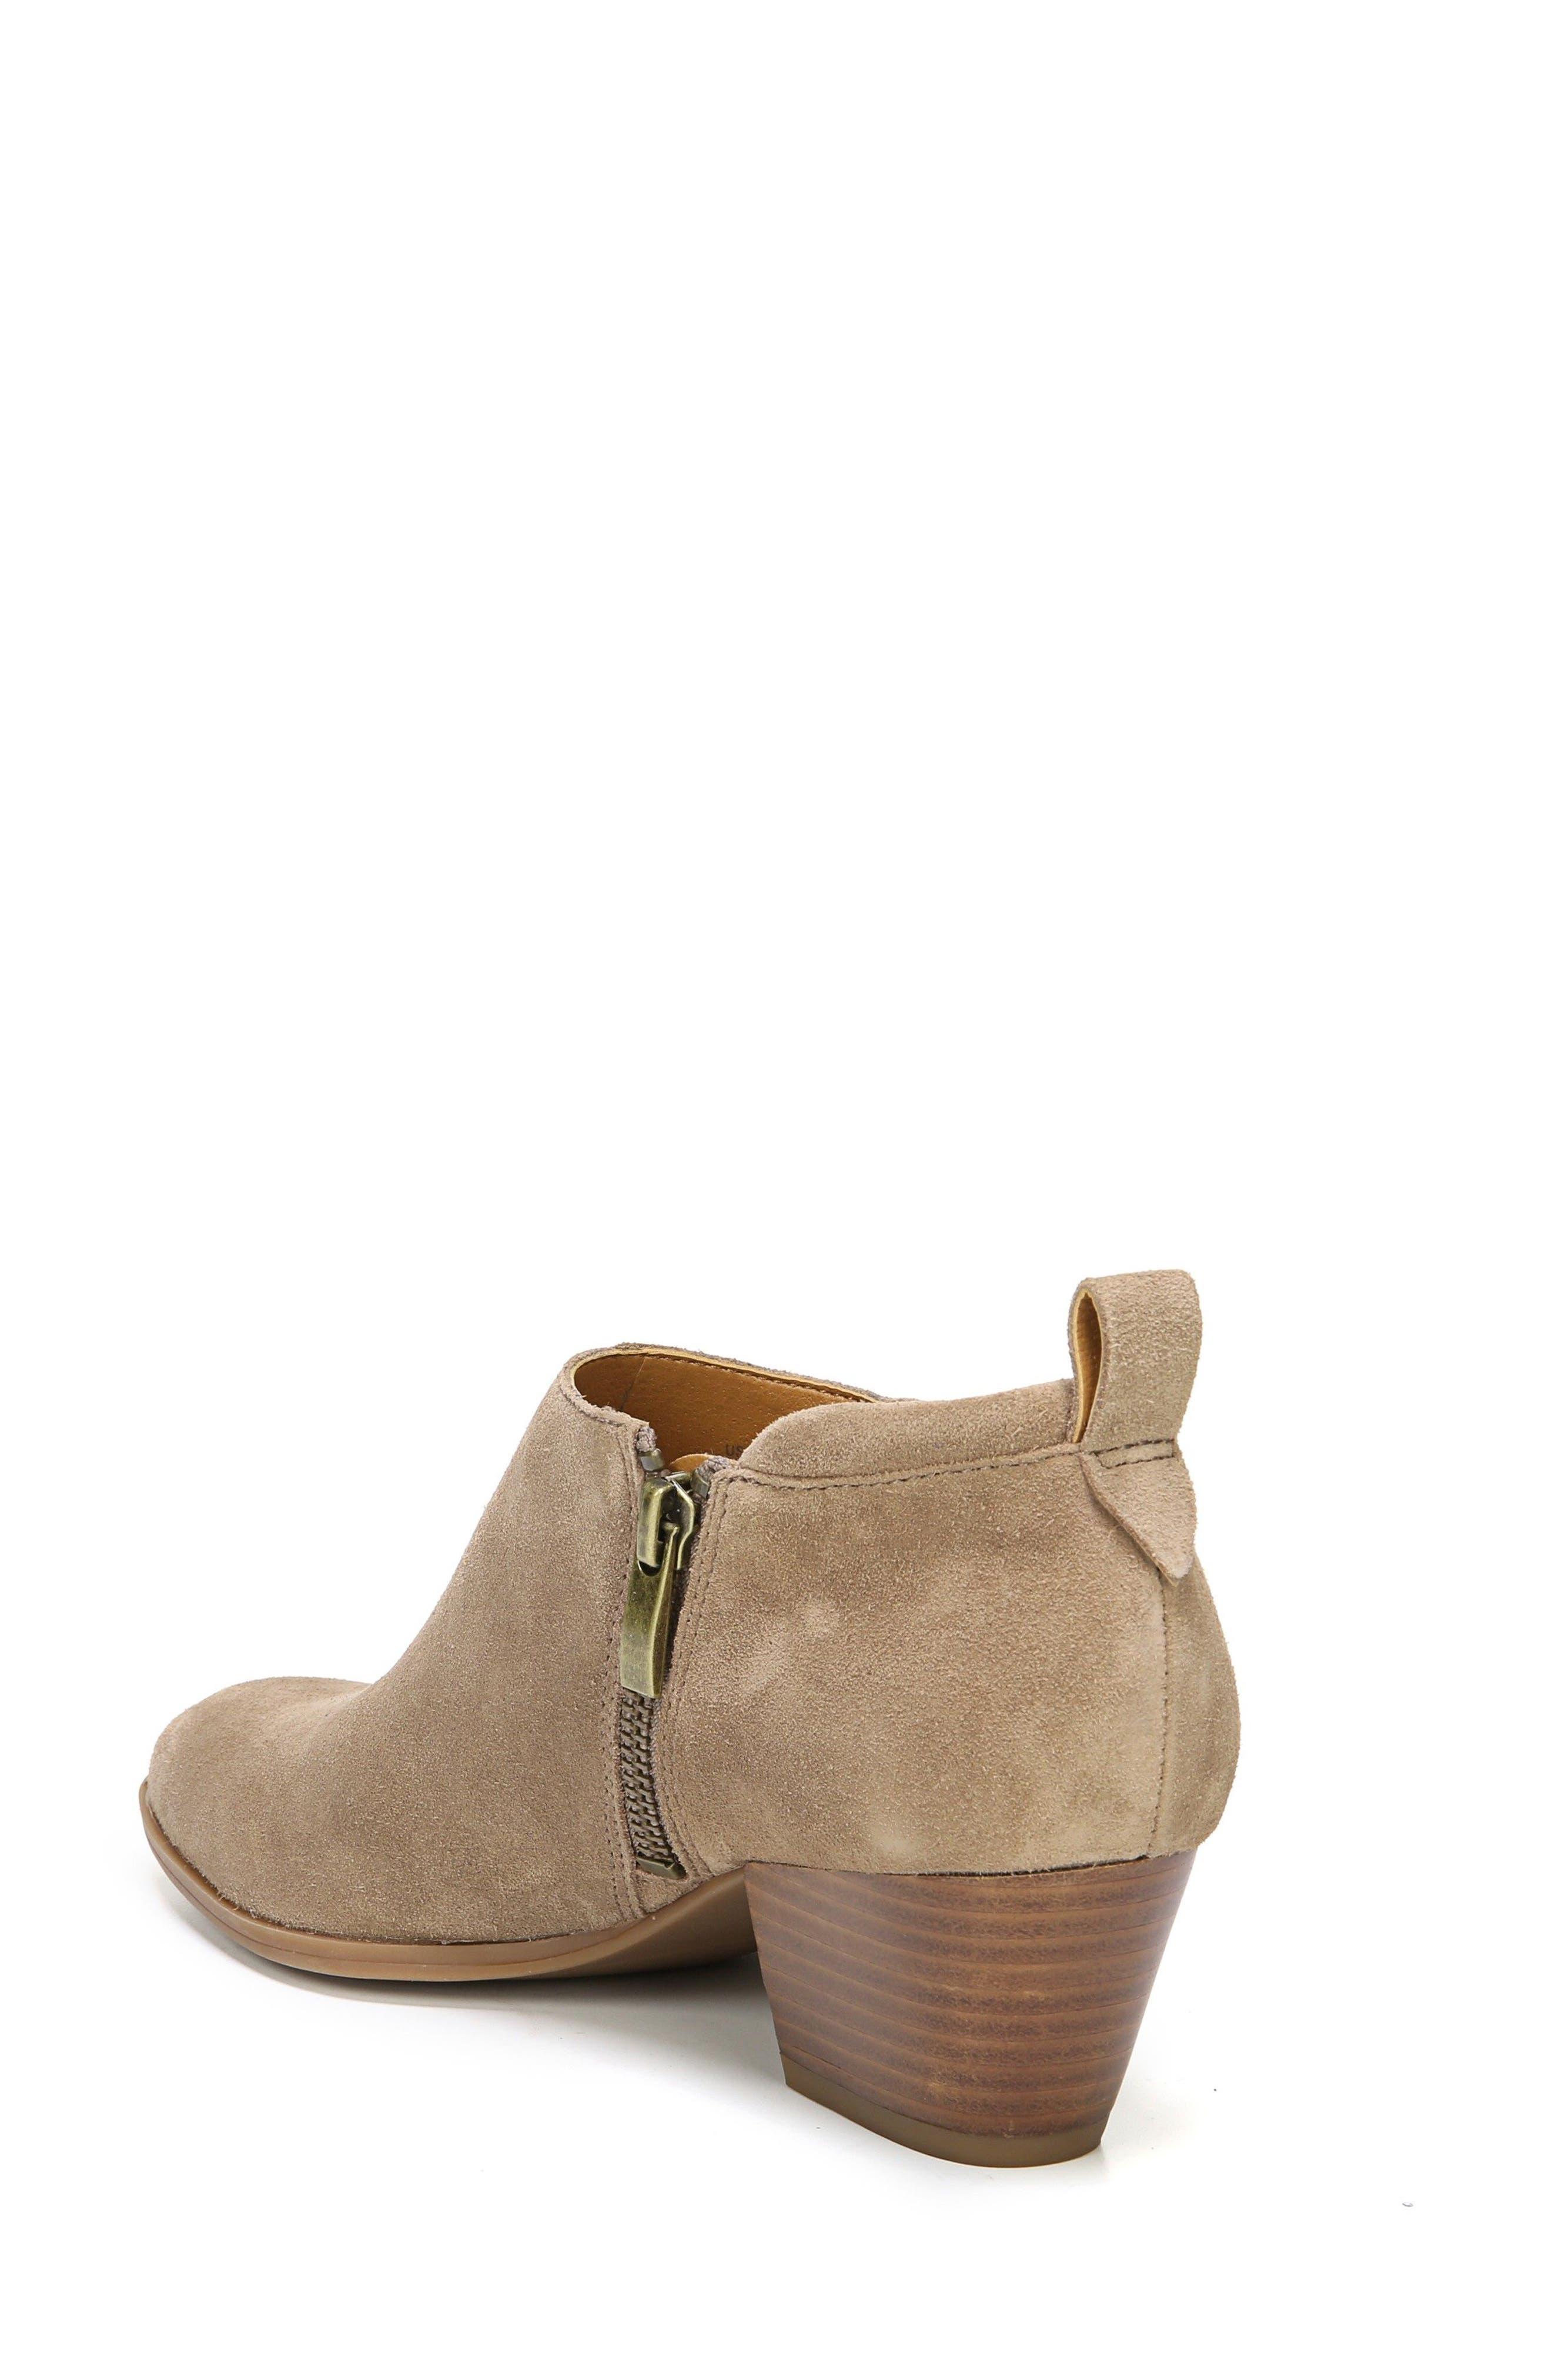 Alternate Image 2  - SARTO by Franco Sarto 'Granite' Block Heel Bootie (Women)